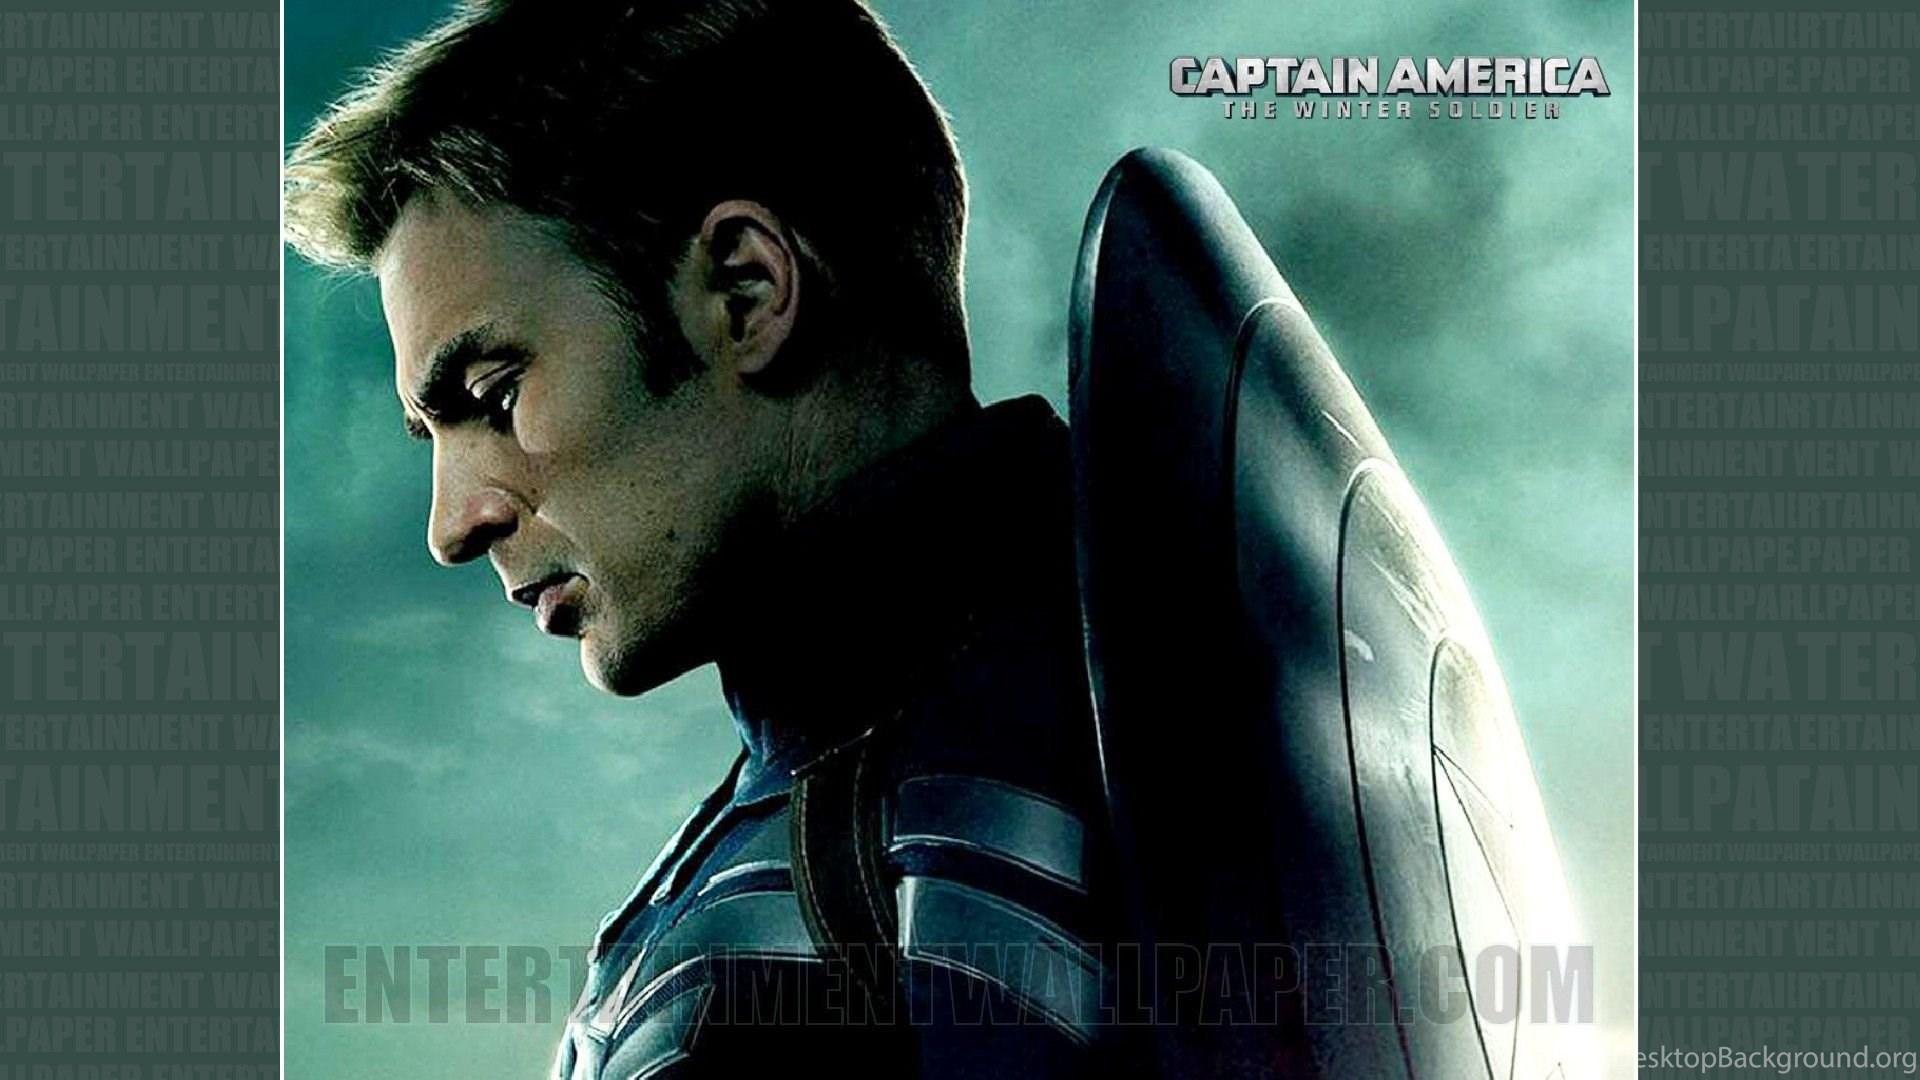 Captain America The Winter Soldier Wallpapers Desktop Background